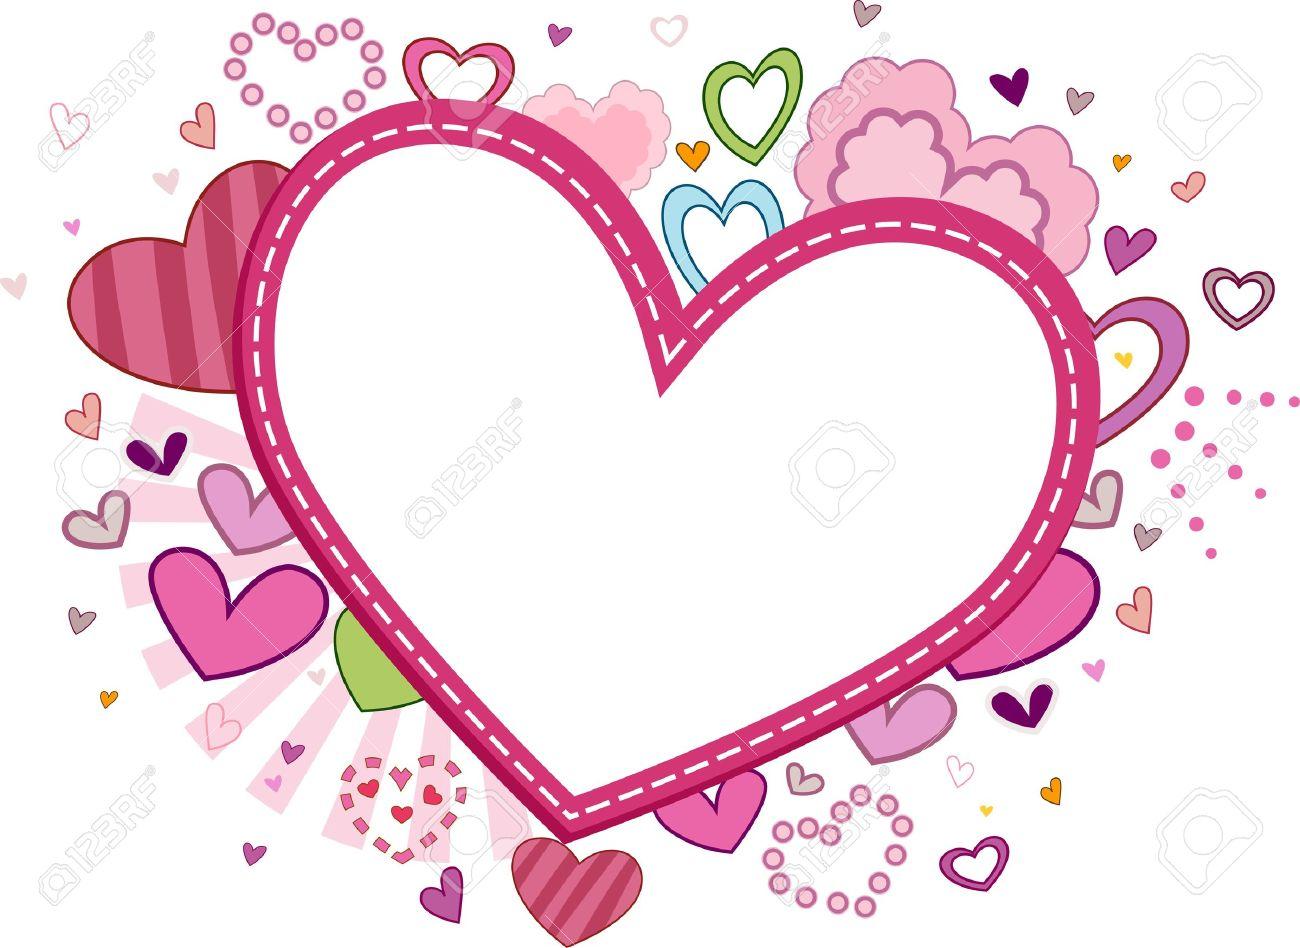 Marco Con Temática San Valentín Con Un Corazón Cosido Fotos ...